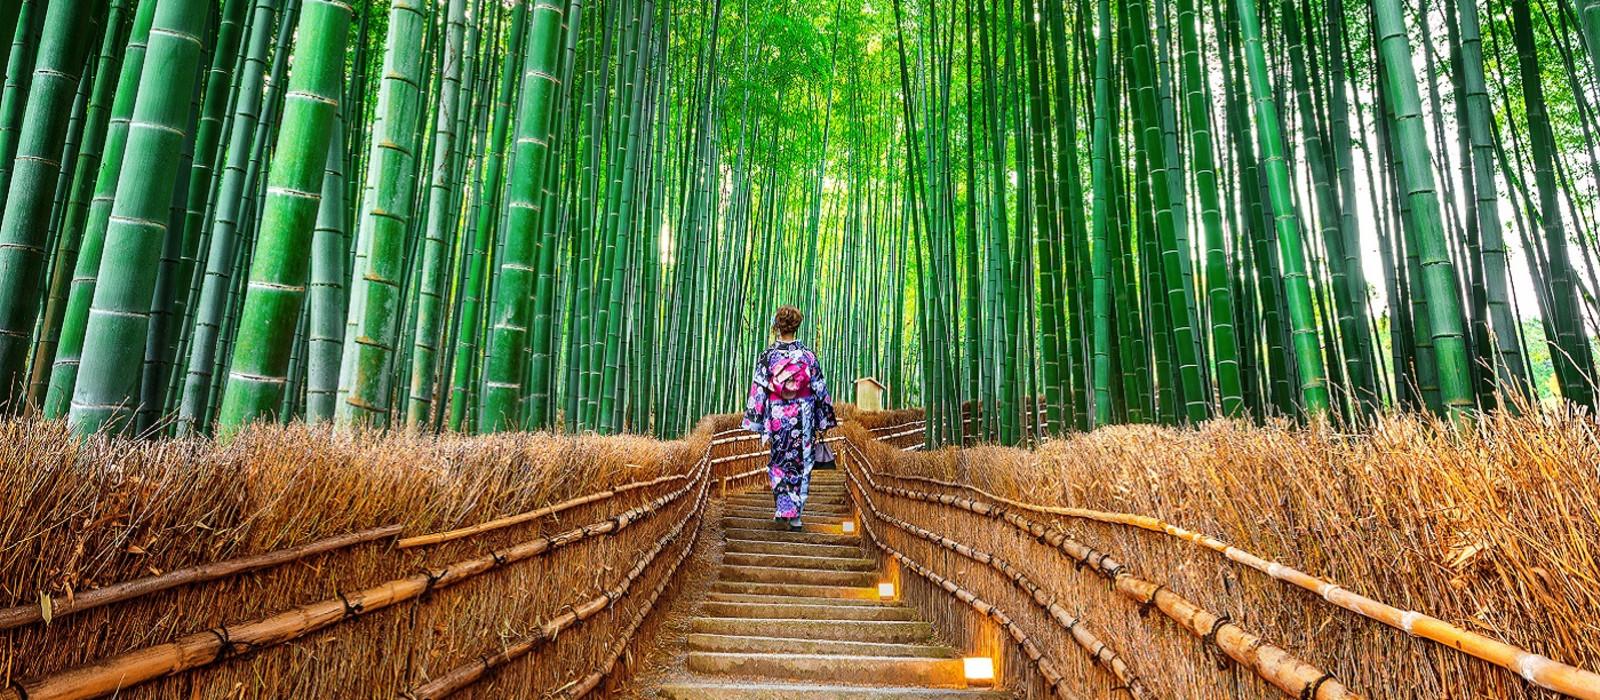 Grand of Japan and Koh Samui Beach Tour Trip 1